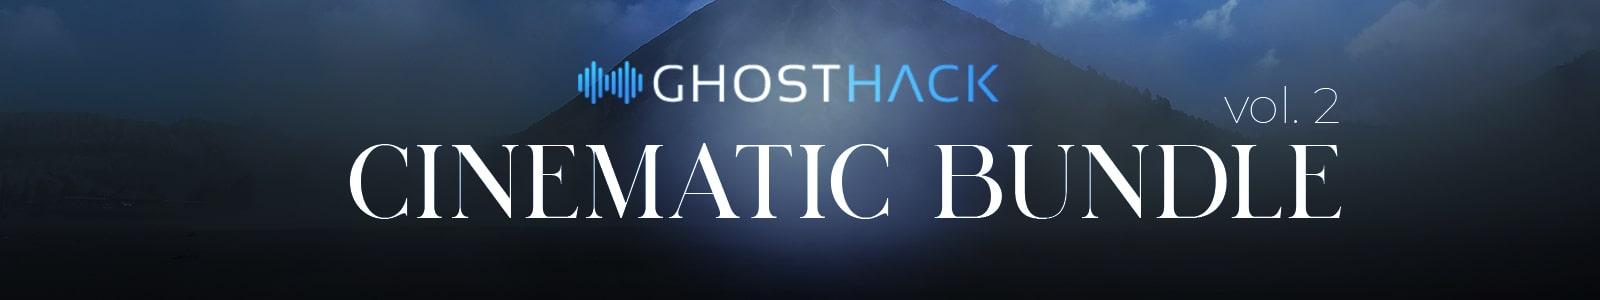 ghosthack ultimate cinematic bundle